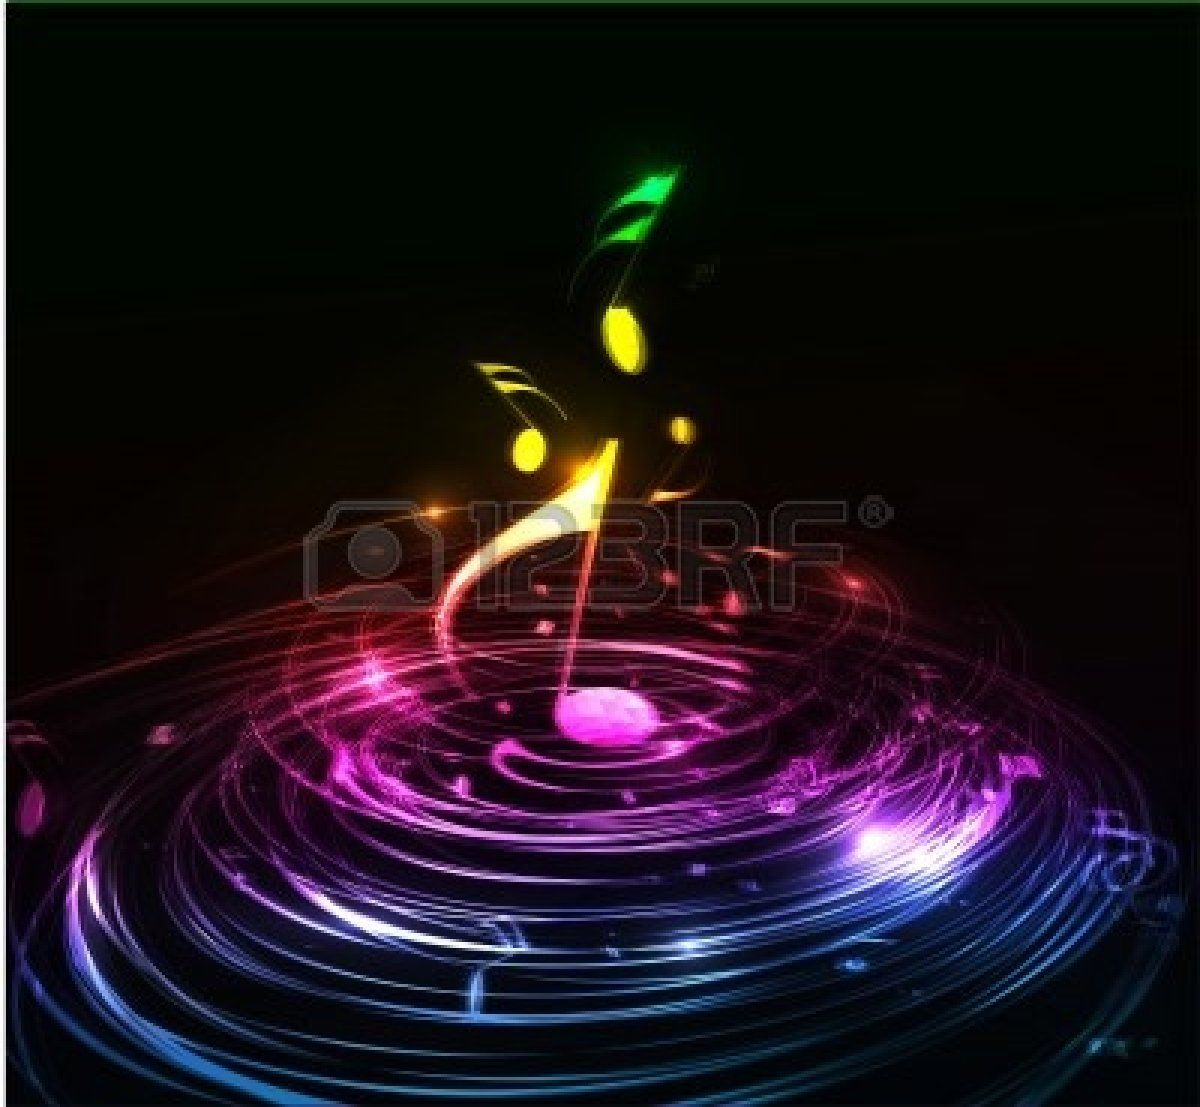 Good Wallpaper Music Violet - d729971805e6274c409e92da7b8111b9  Snapshot_866290.jpg